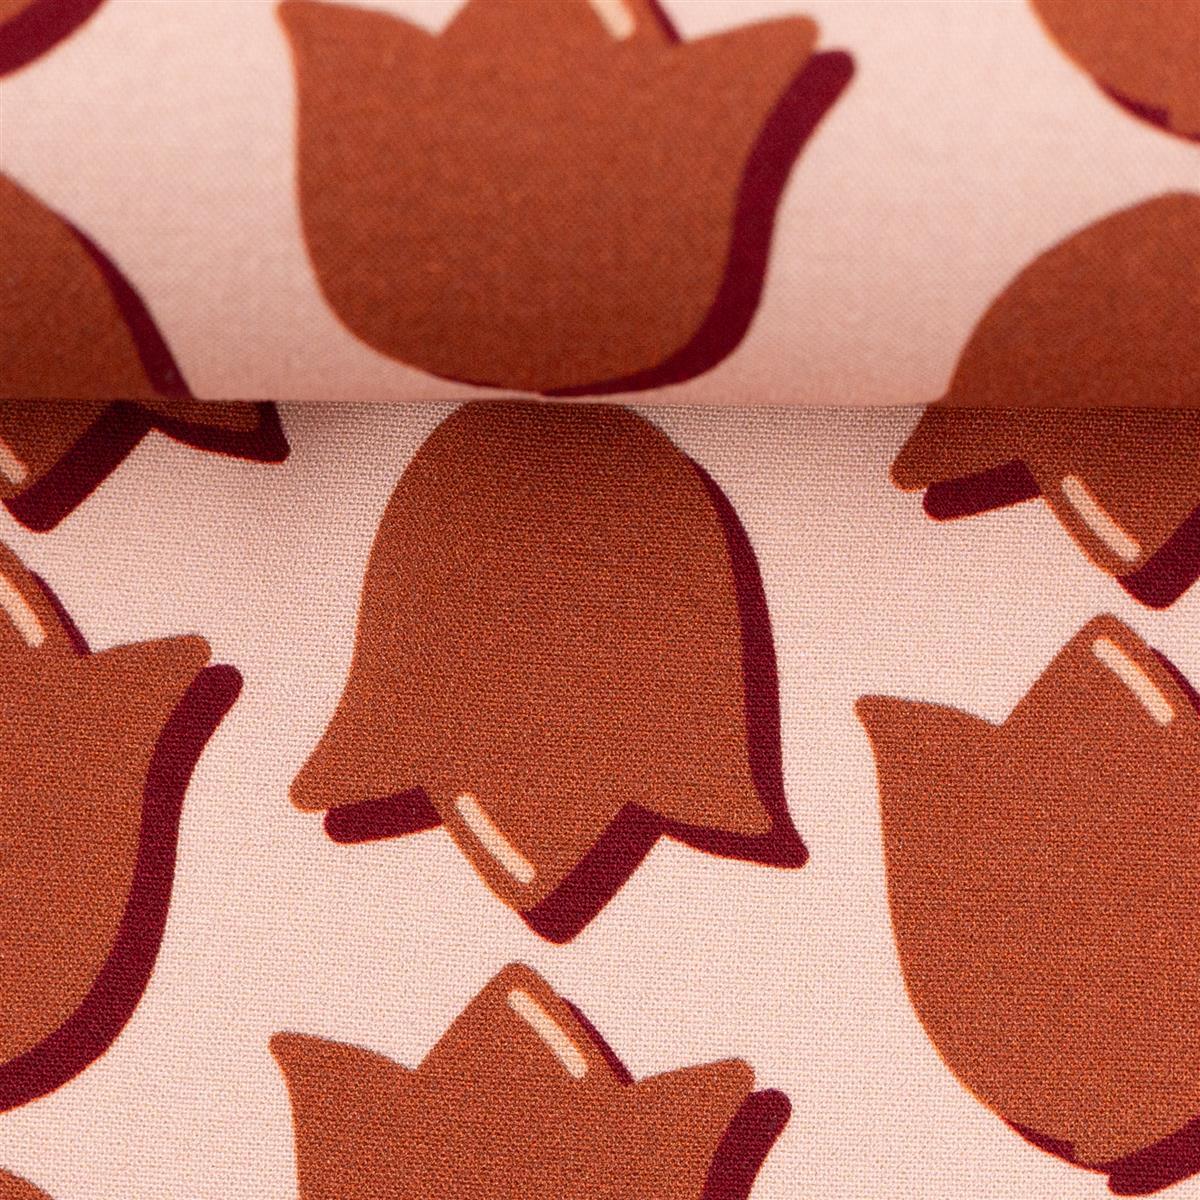 081349-100431-retro-tulips-cherry-picking-ballen